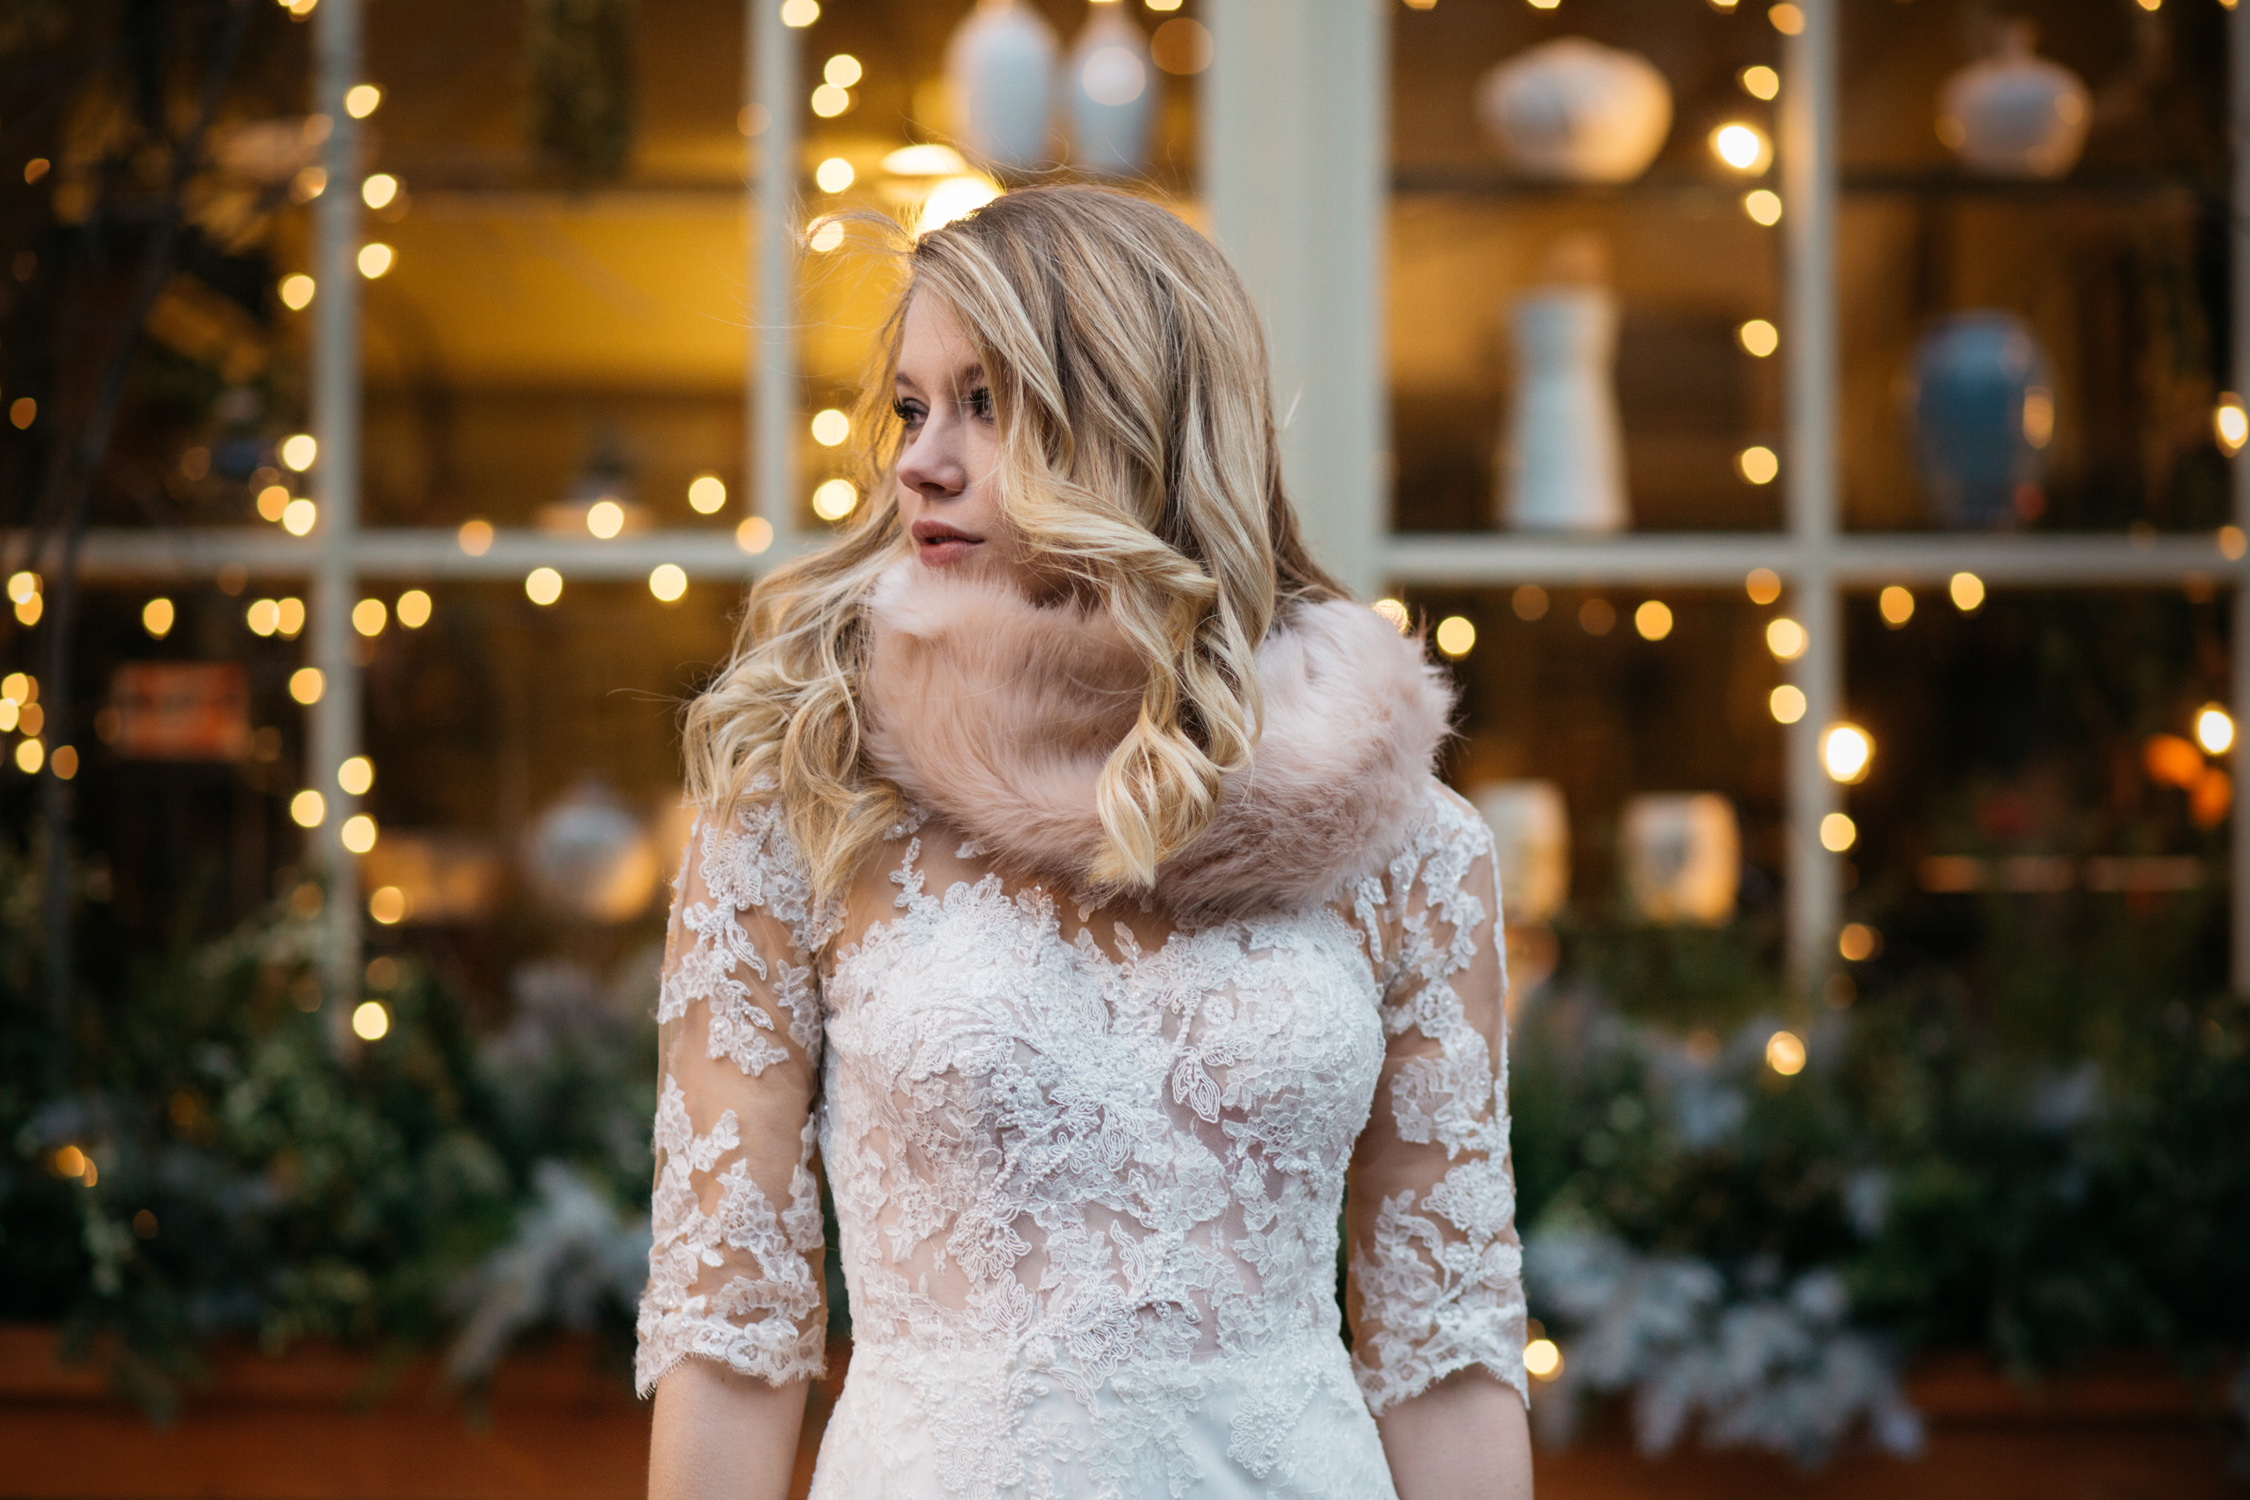 lucas_confectionery_wedding_007.jpg